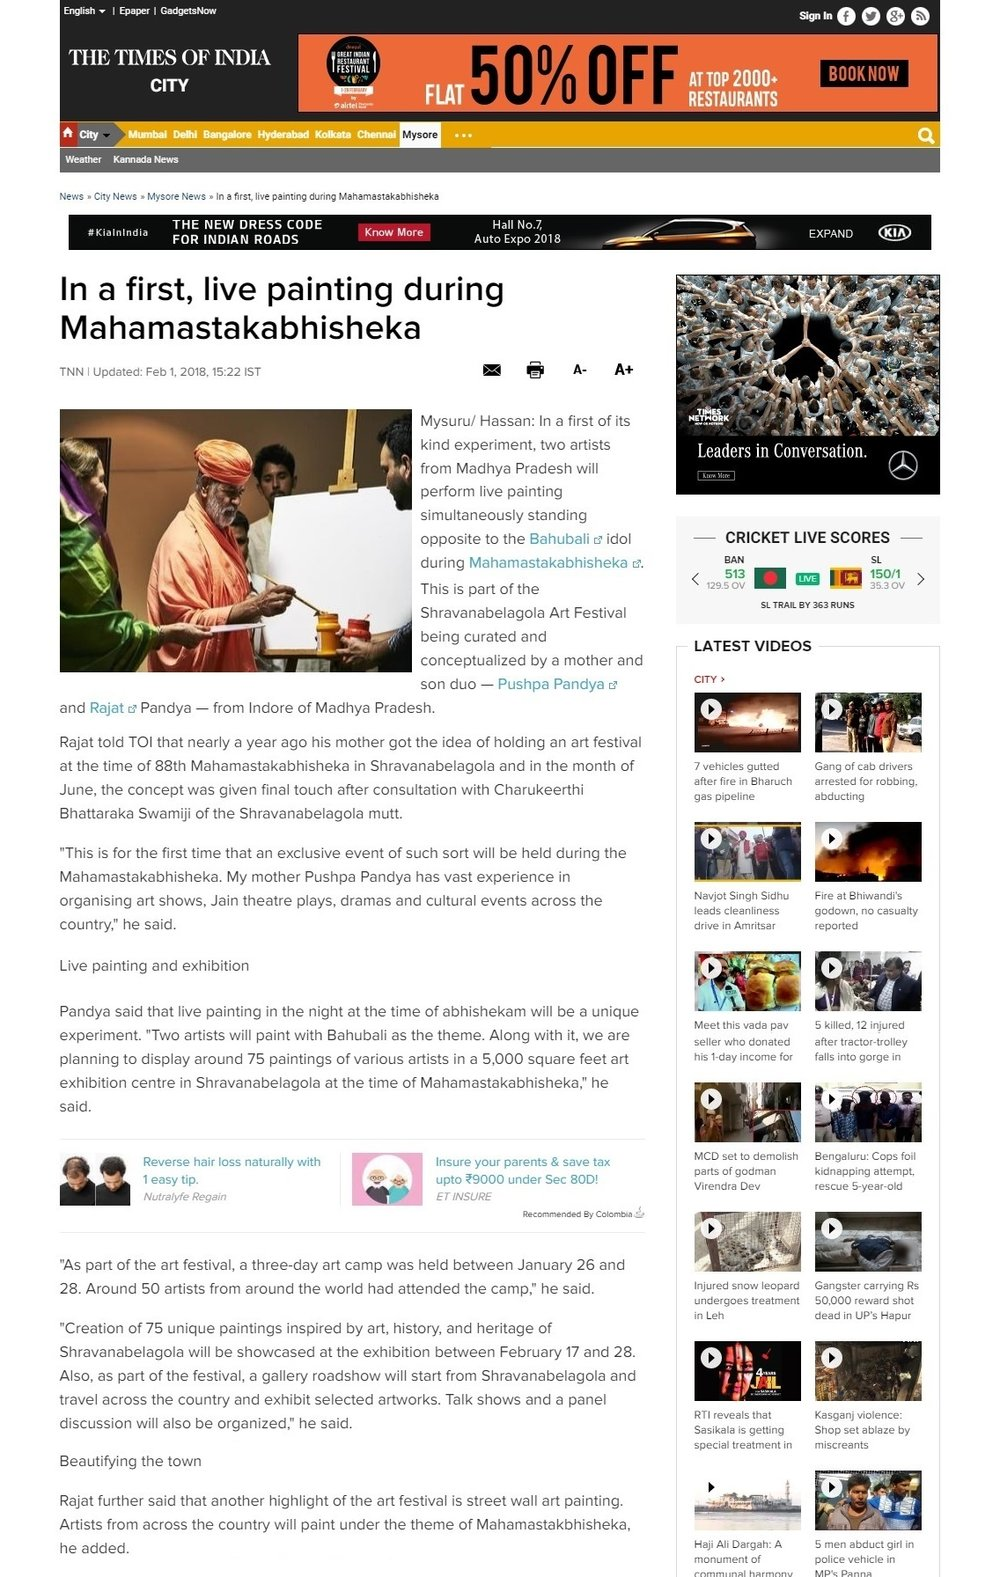 TimesofIndia1stFeb.jpg